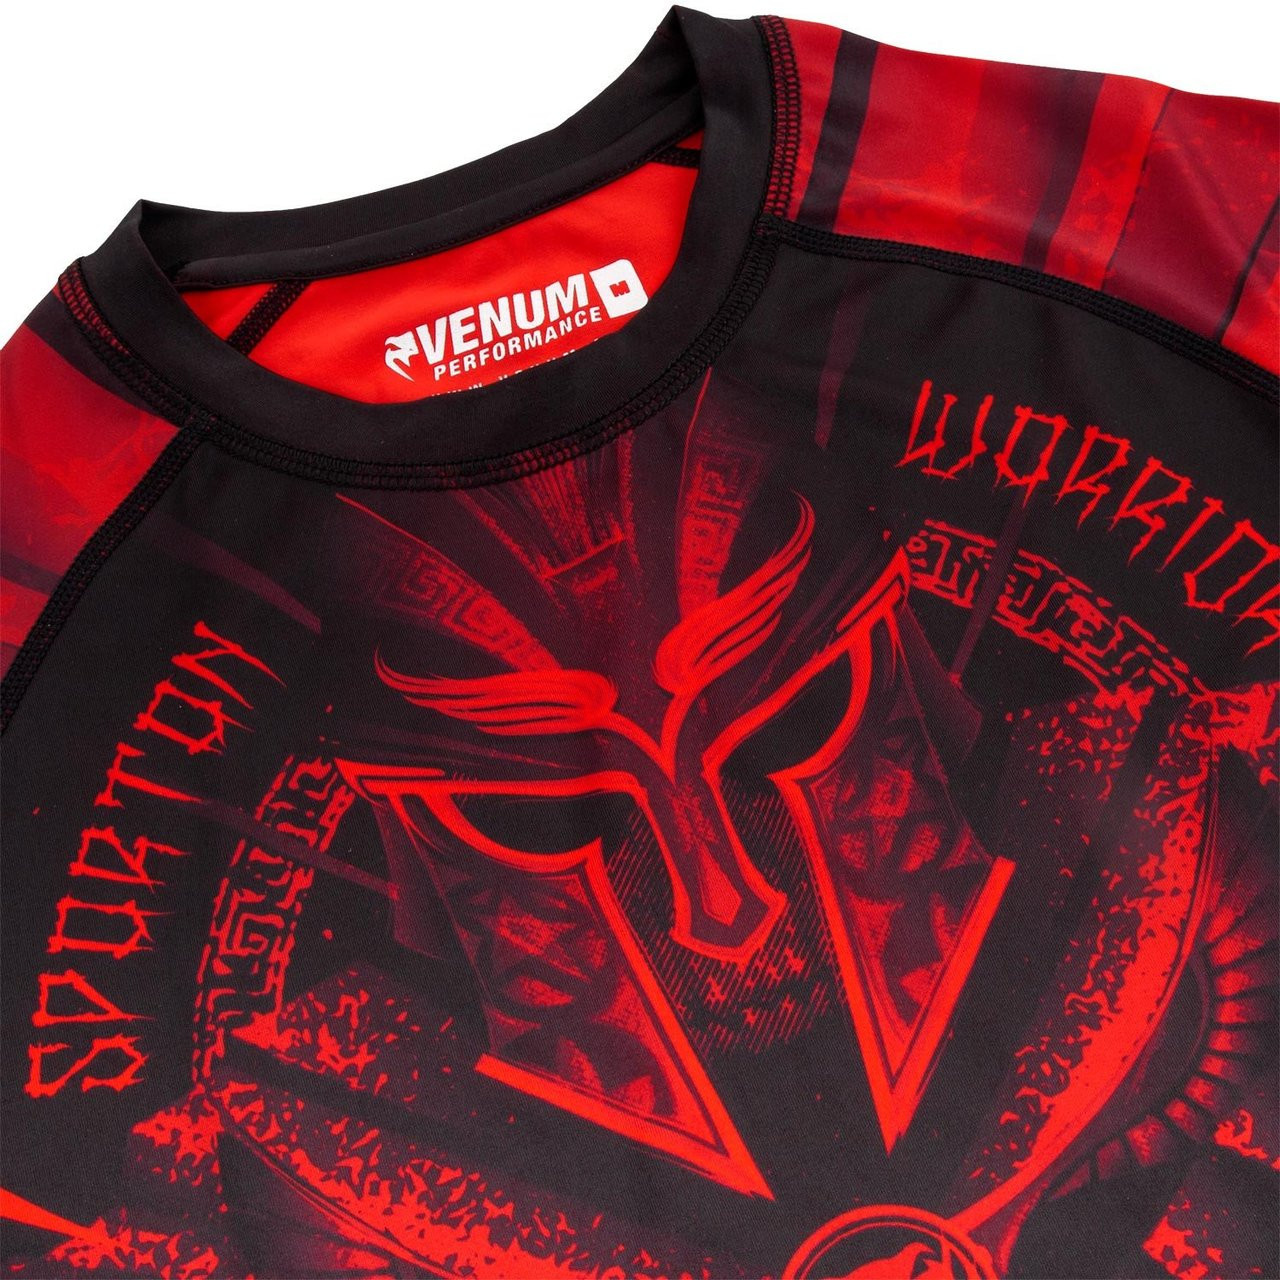 Venum Gladiator 3.0 Longsleeve Rashguard (Black/Red)  Available at www.thejiujitsushop.com  Enjoy Free Shipping from The Jiu Jitsu Shop.